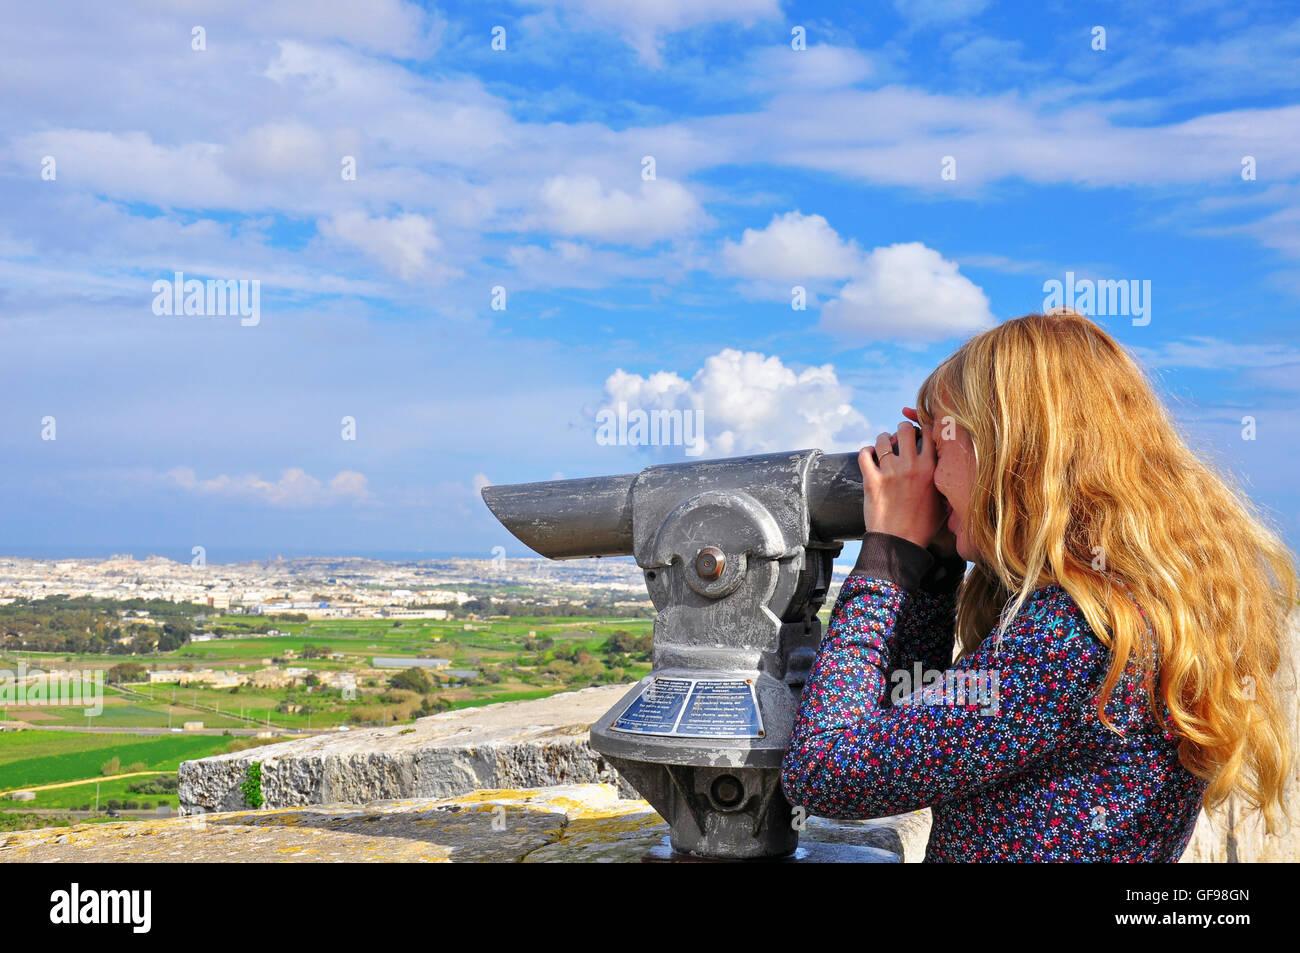 Blondy long-hair girl looking in telescope. Maltese Islands - Stock Image